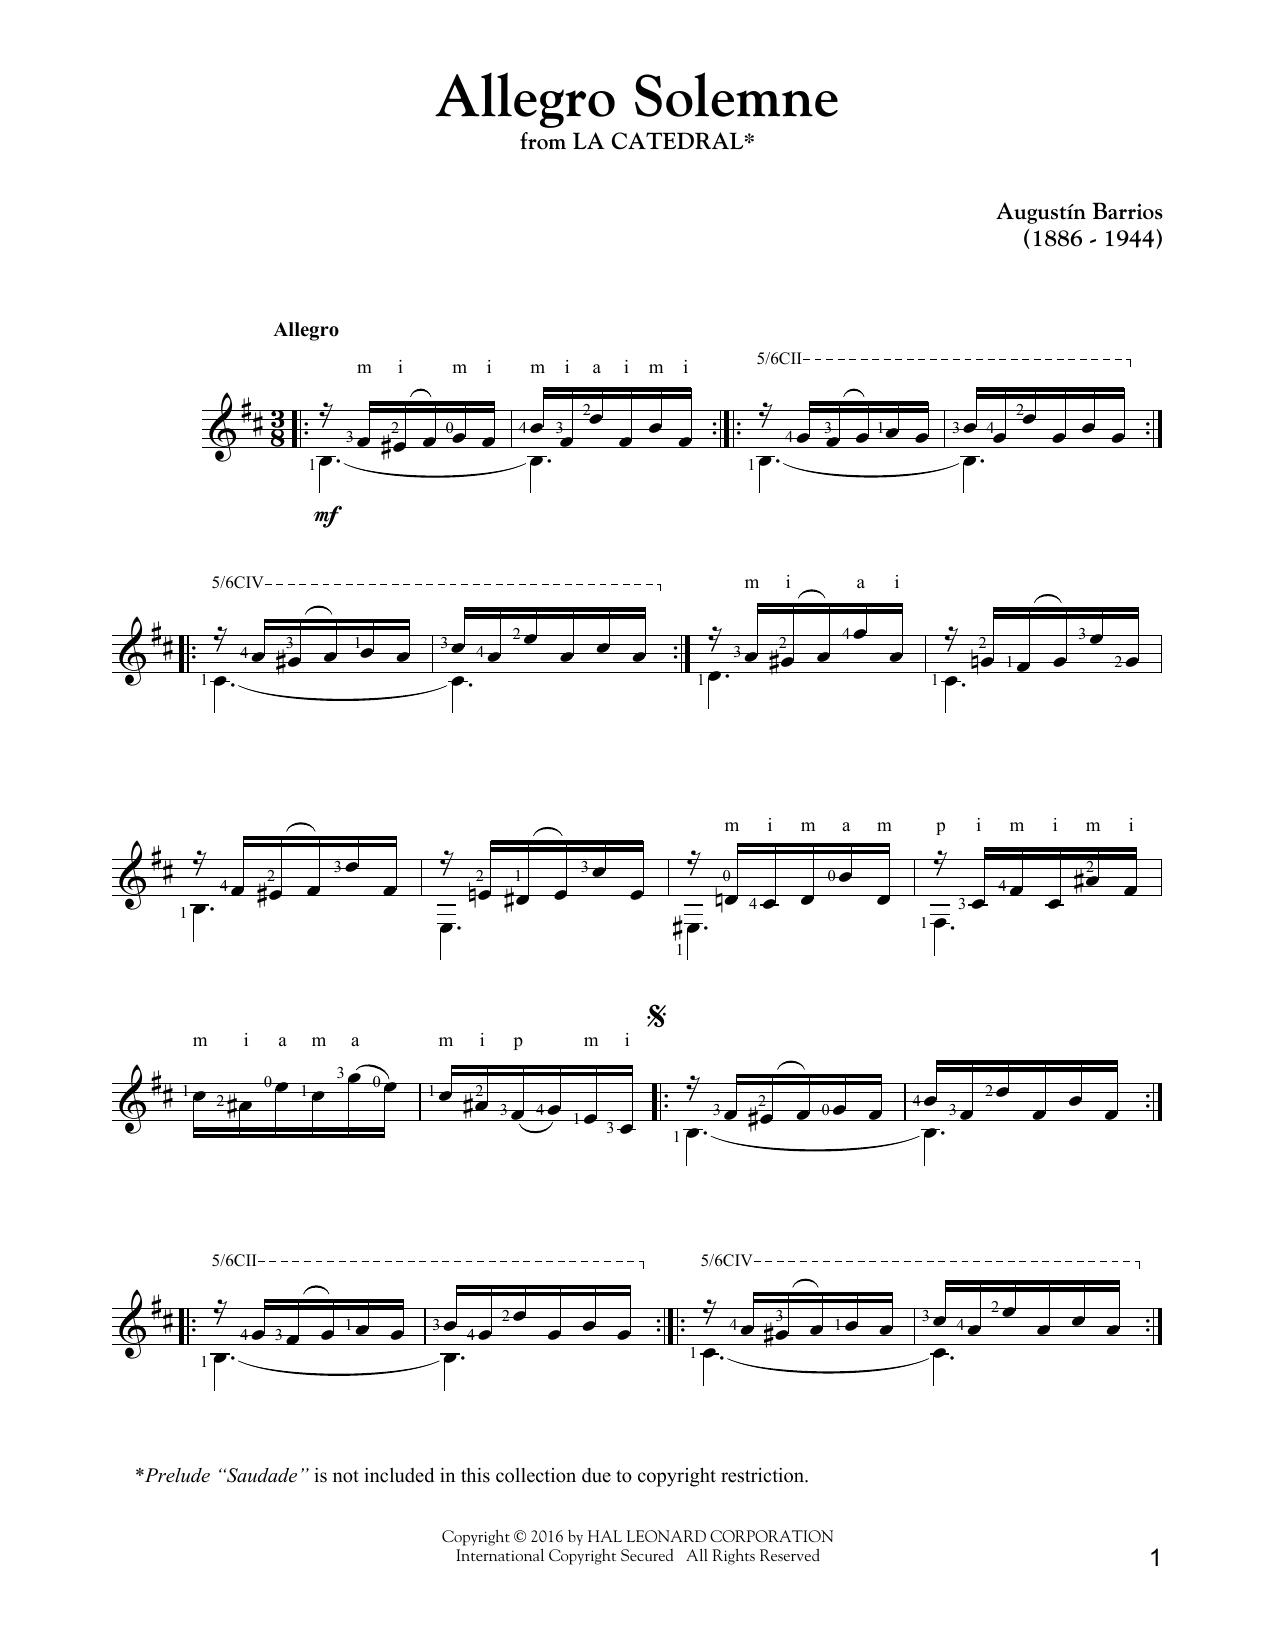 Augustin Barrios Mangore Allegro Solemne Sheet Music Notes Chords Score Download Printable Pdf Sheet Music Notes Sheet Music Music Notes